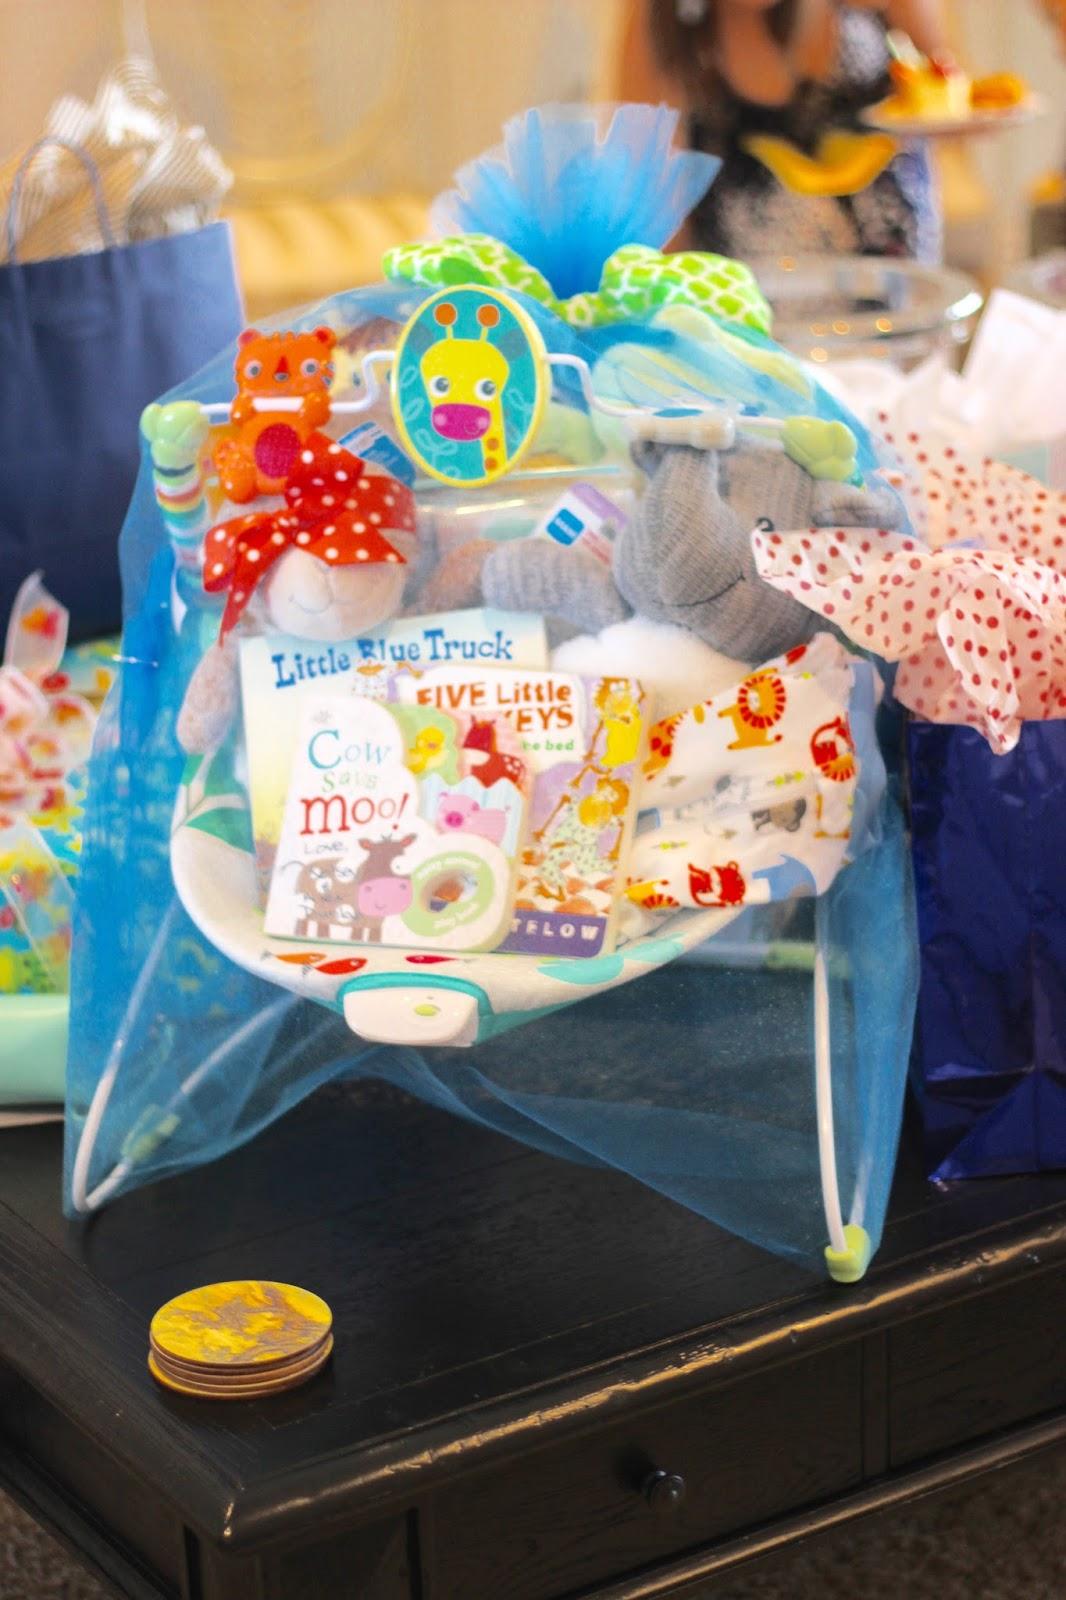 The Neapolitan baby shower